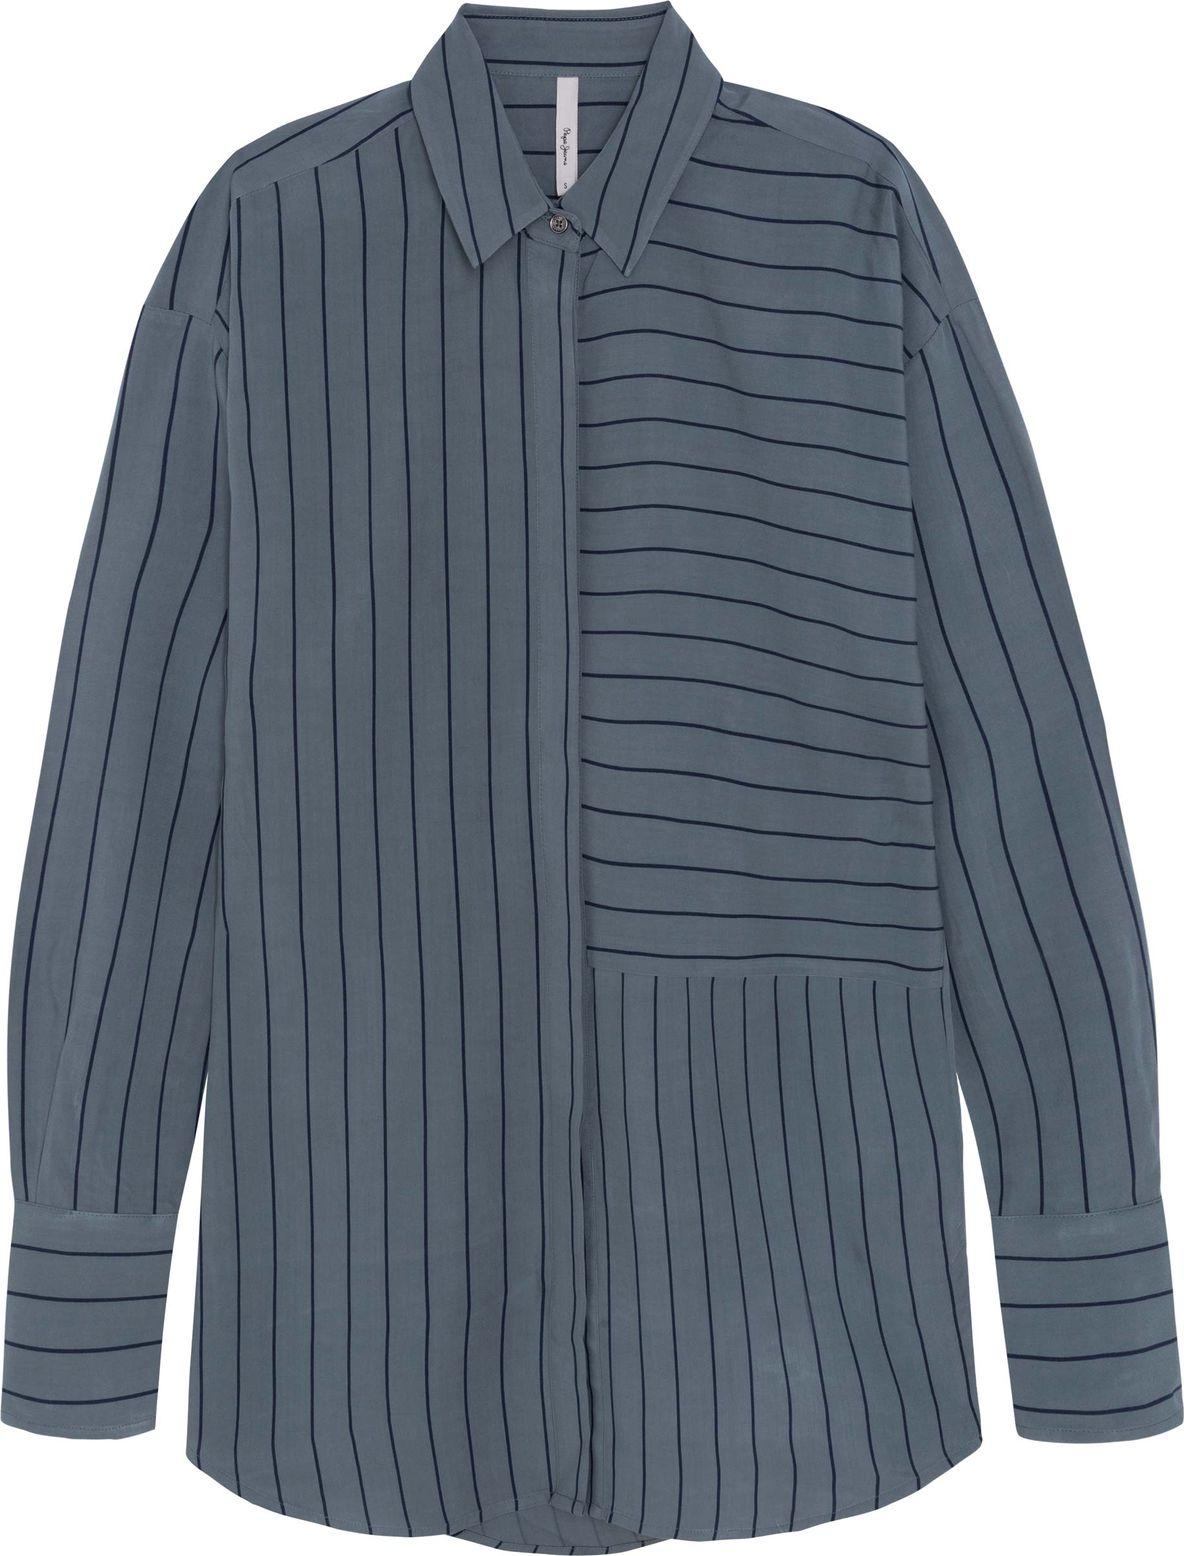 Блузка Pepe Jeans блузка женская pepe jeans цвет синий 097 pl303141 551 размер l 48 50